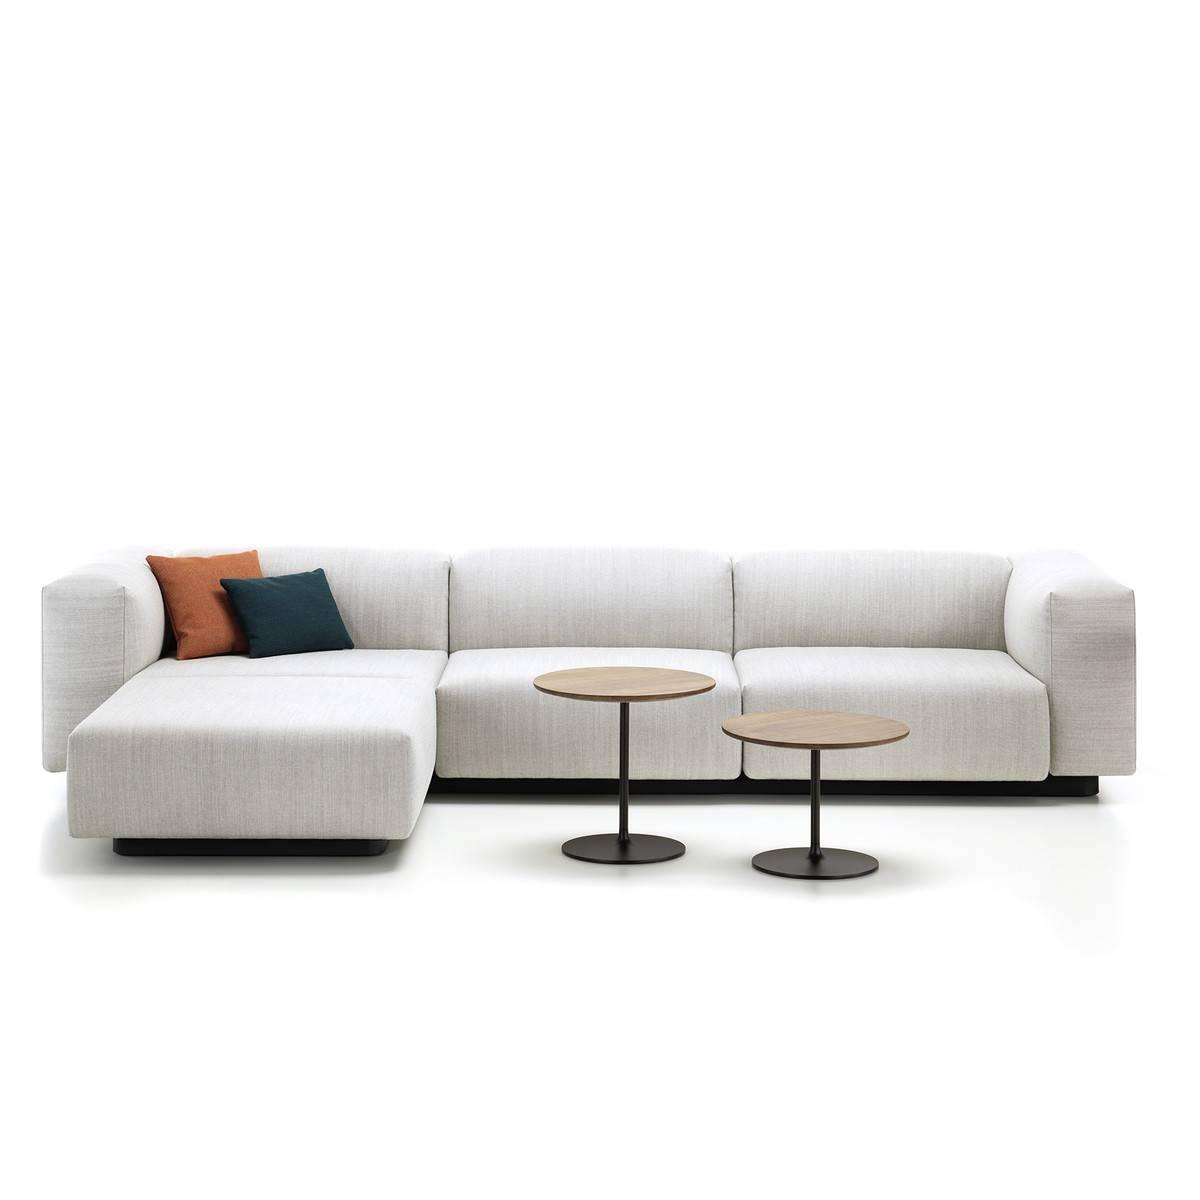 Buy The Soft Modular Corner Sofa From Vitra throughout Modular Corner Sofas (Image 9 of 30)